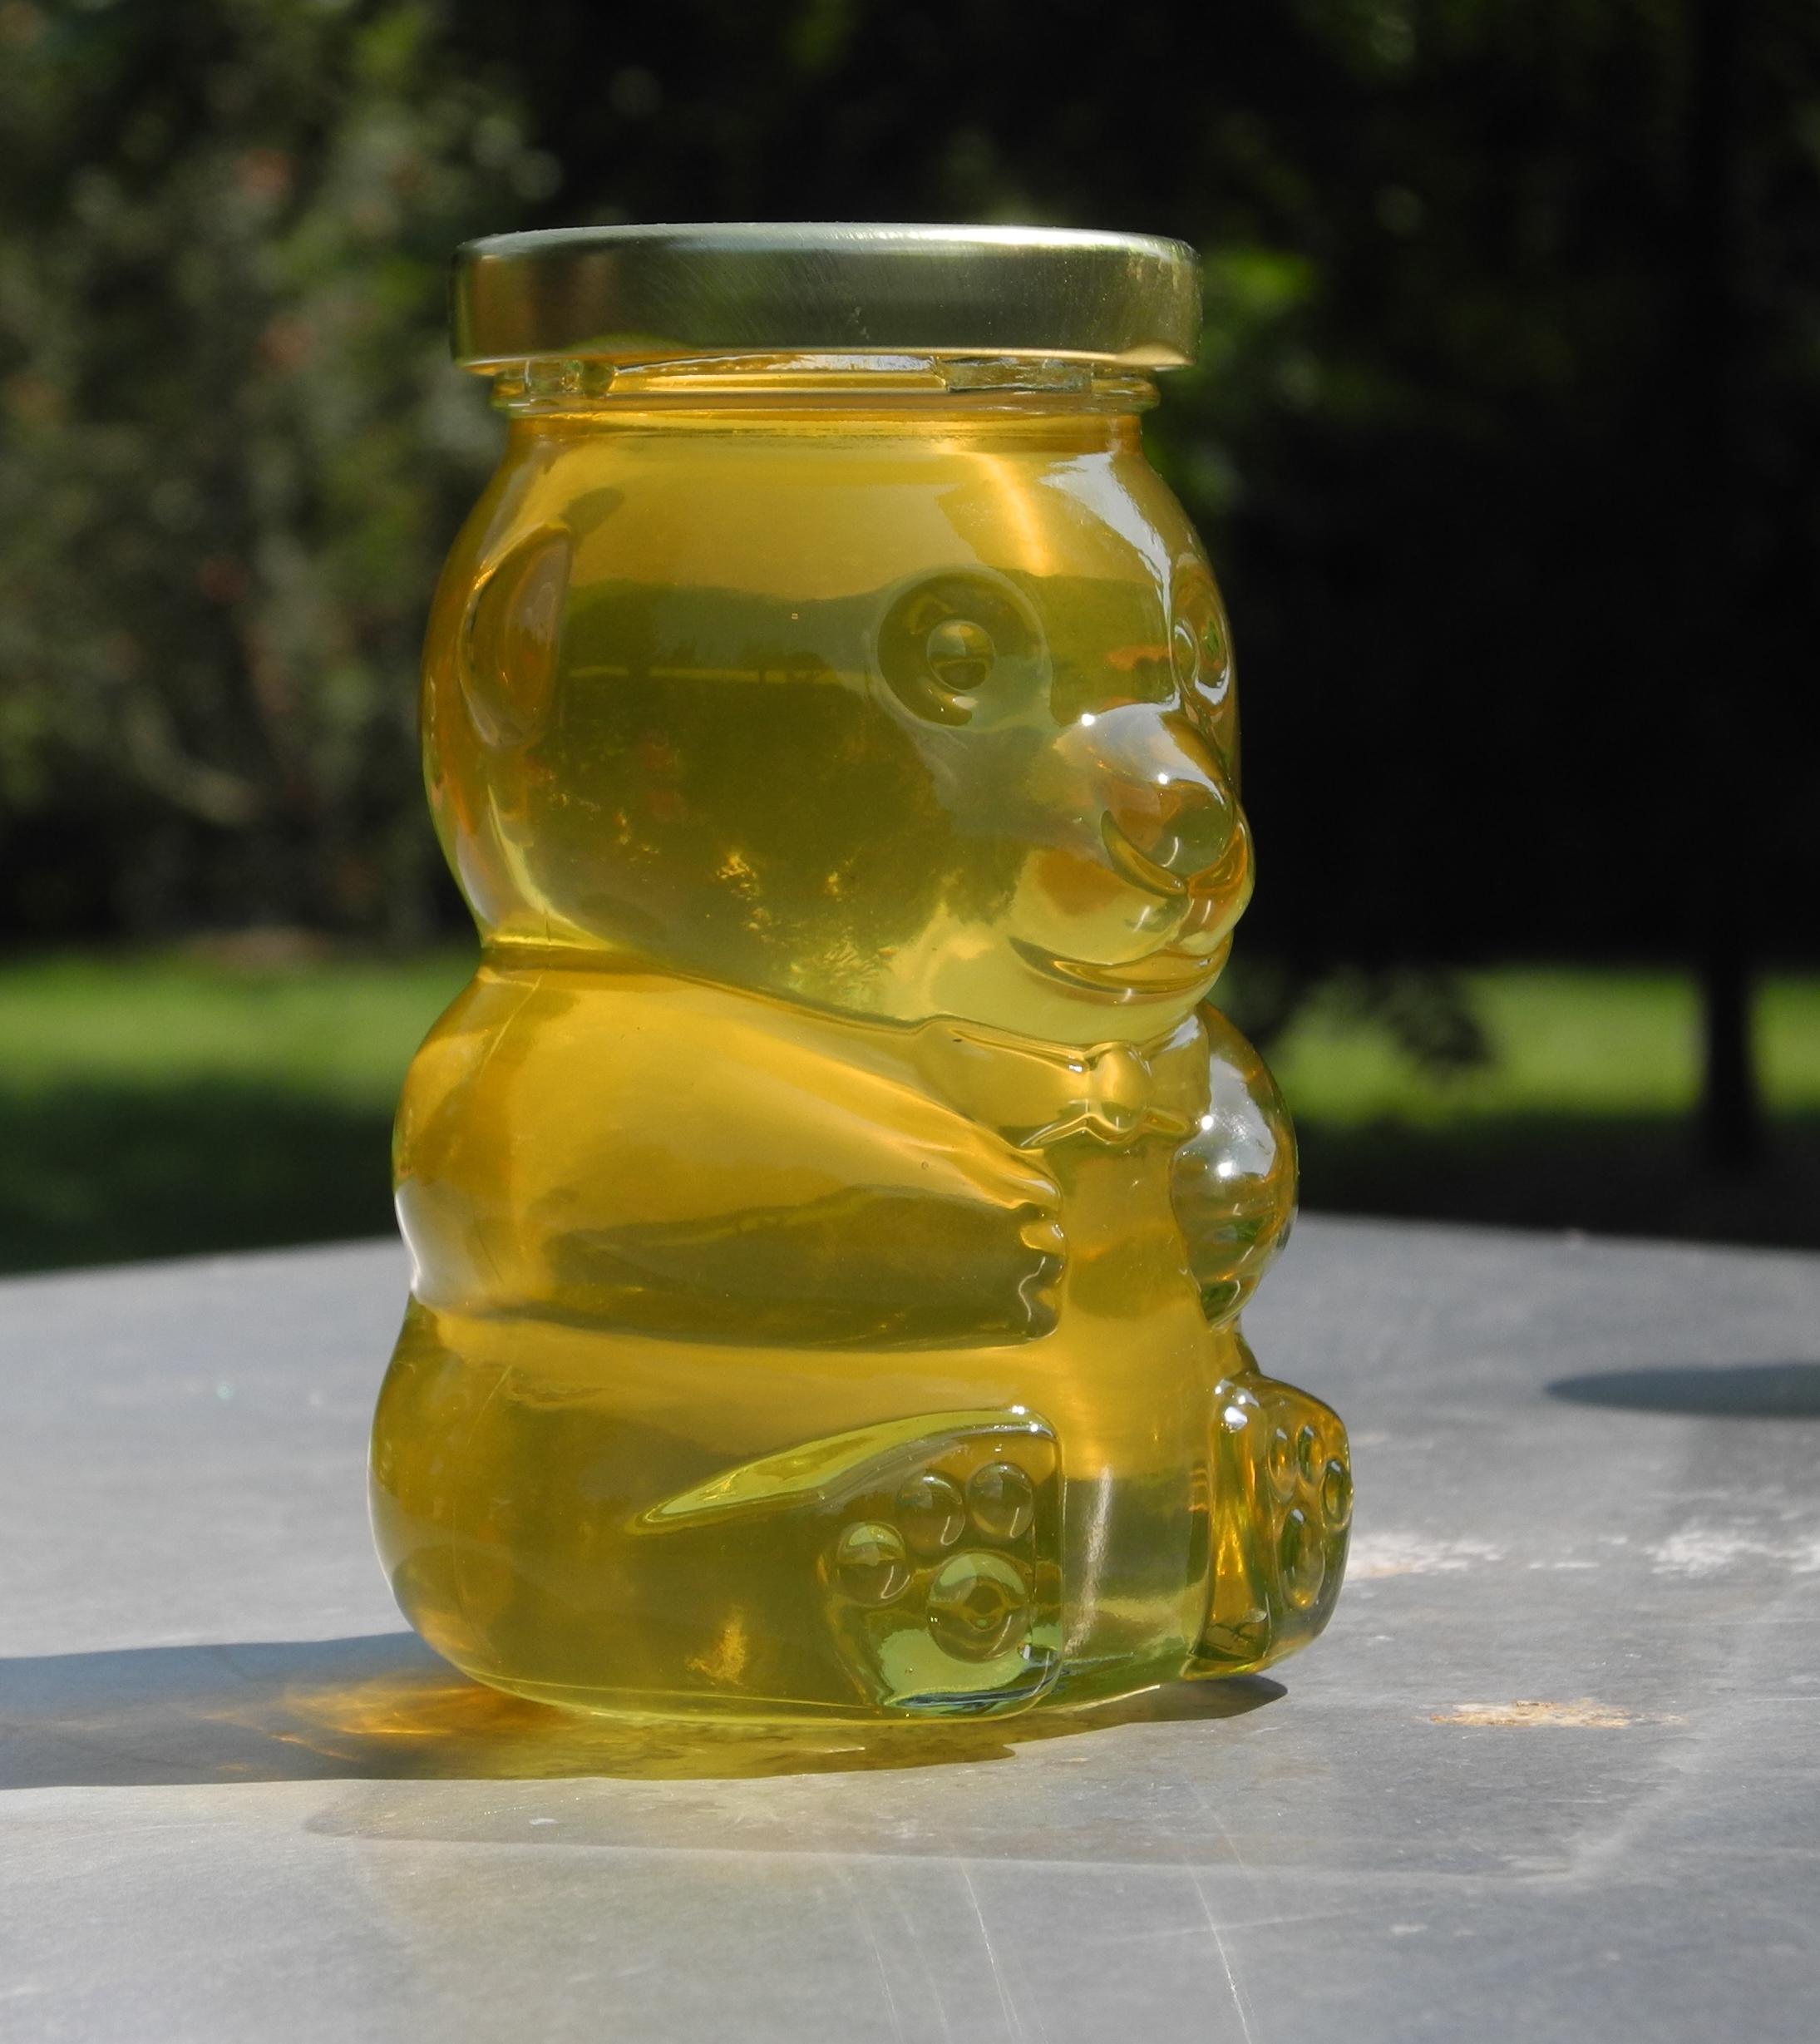 Early season Honey Bear